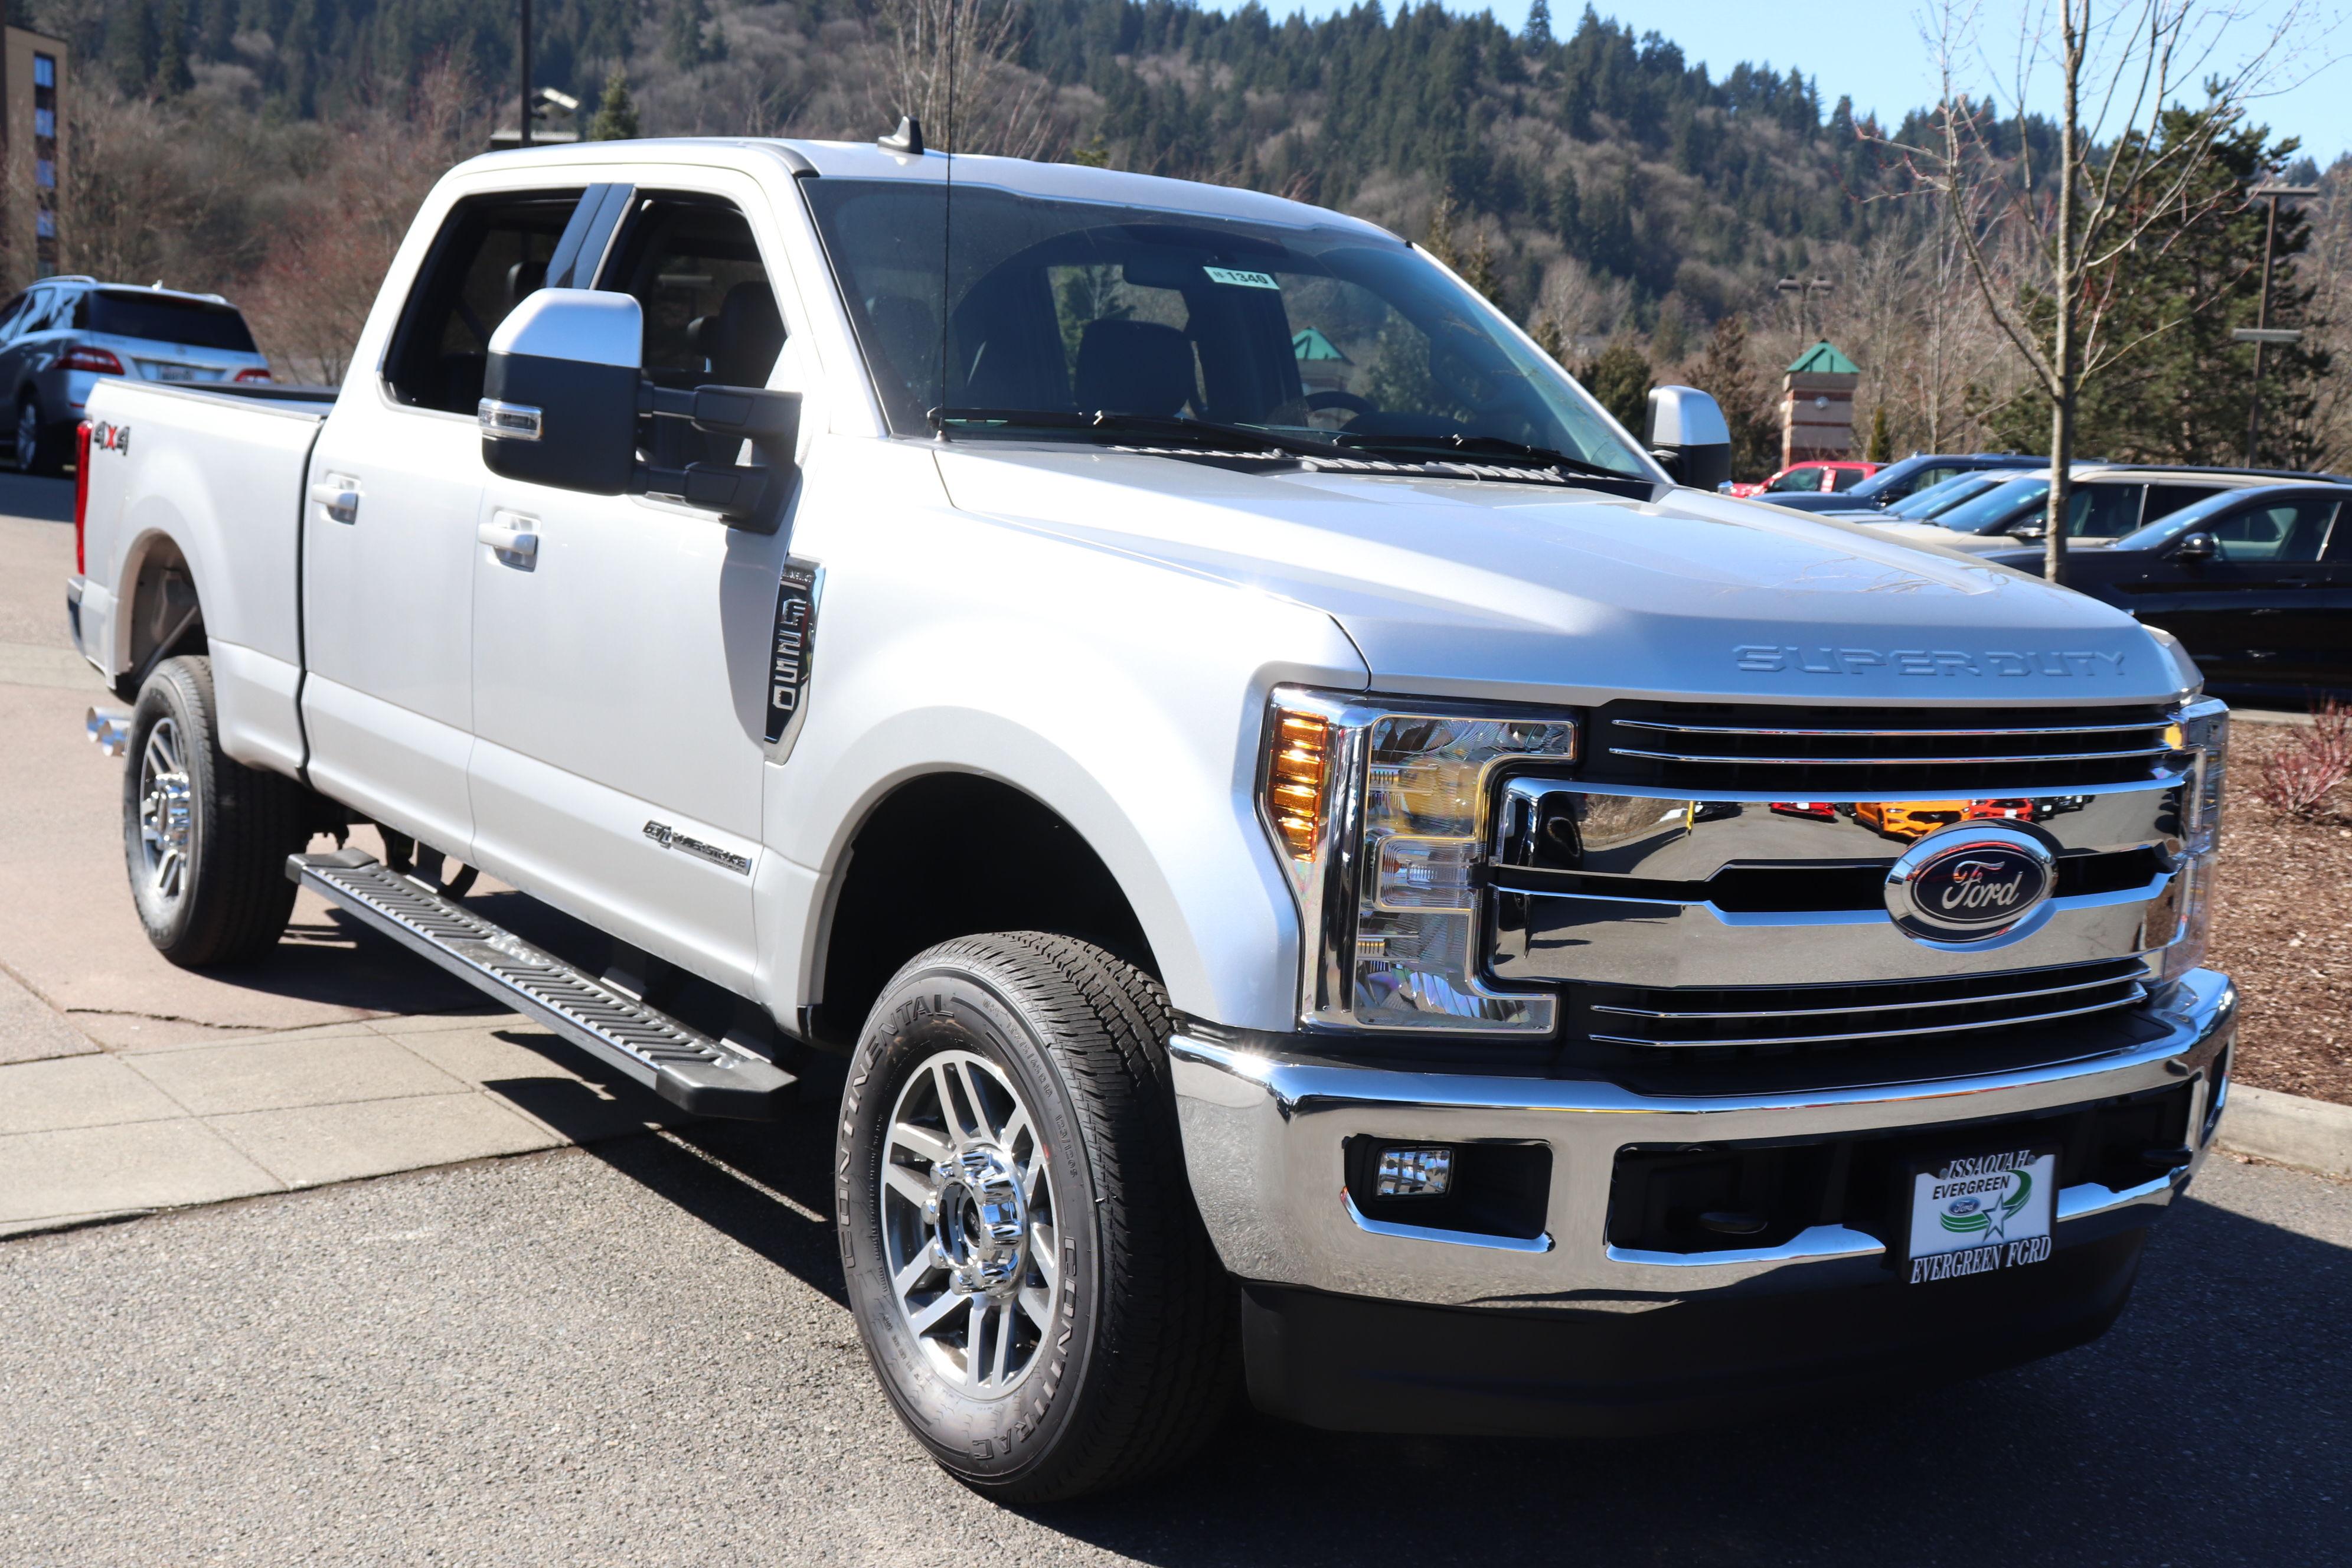 2019 Ford Super Duty for Sale near Bellevue